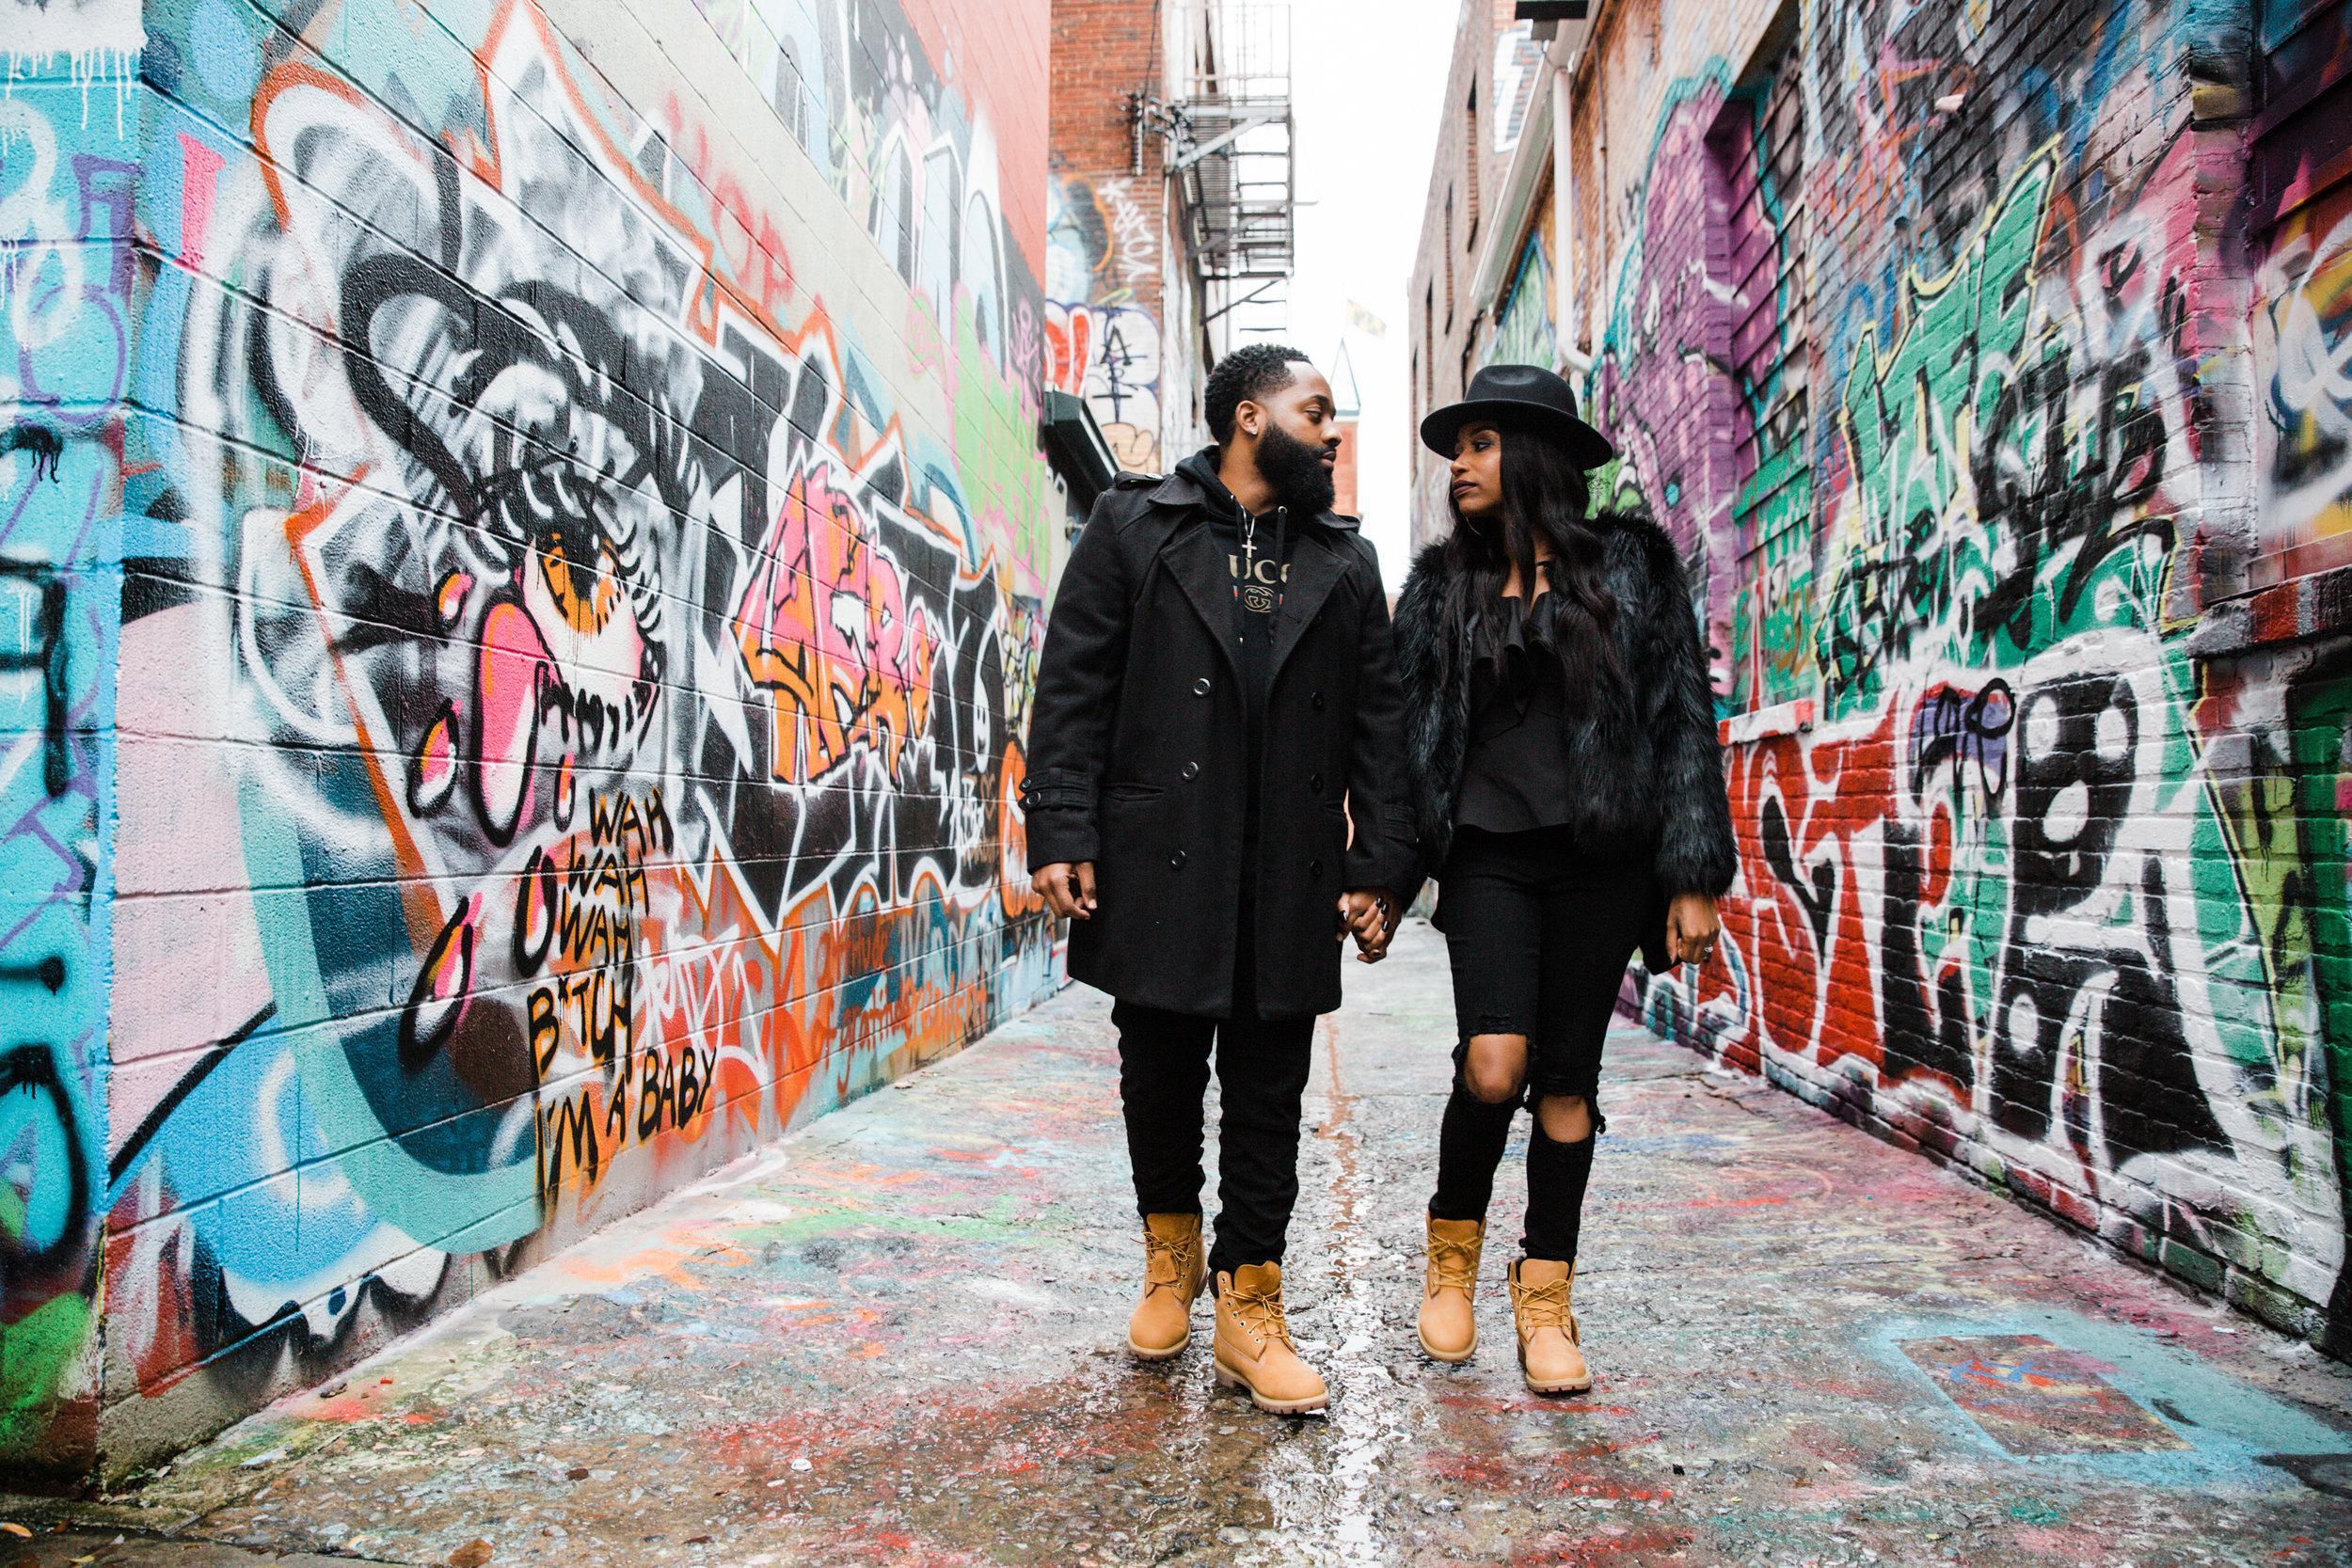 Creative Baltimore Graffiti Alley Engagement Session Megapixels Media Photography-4.jpg